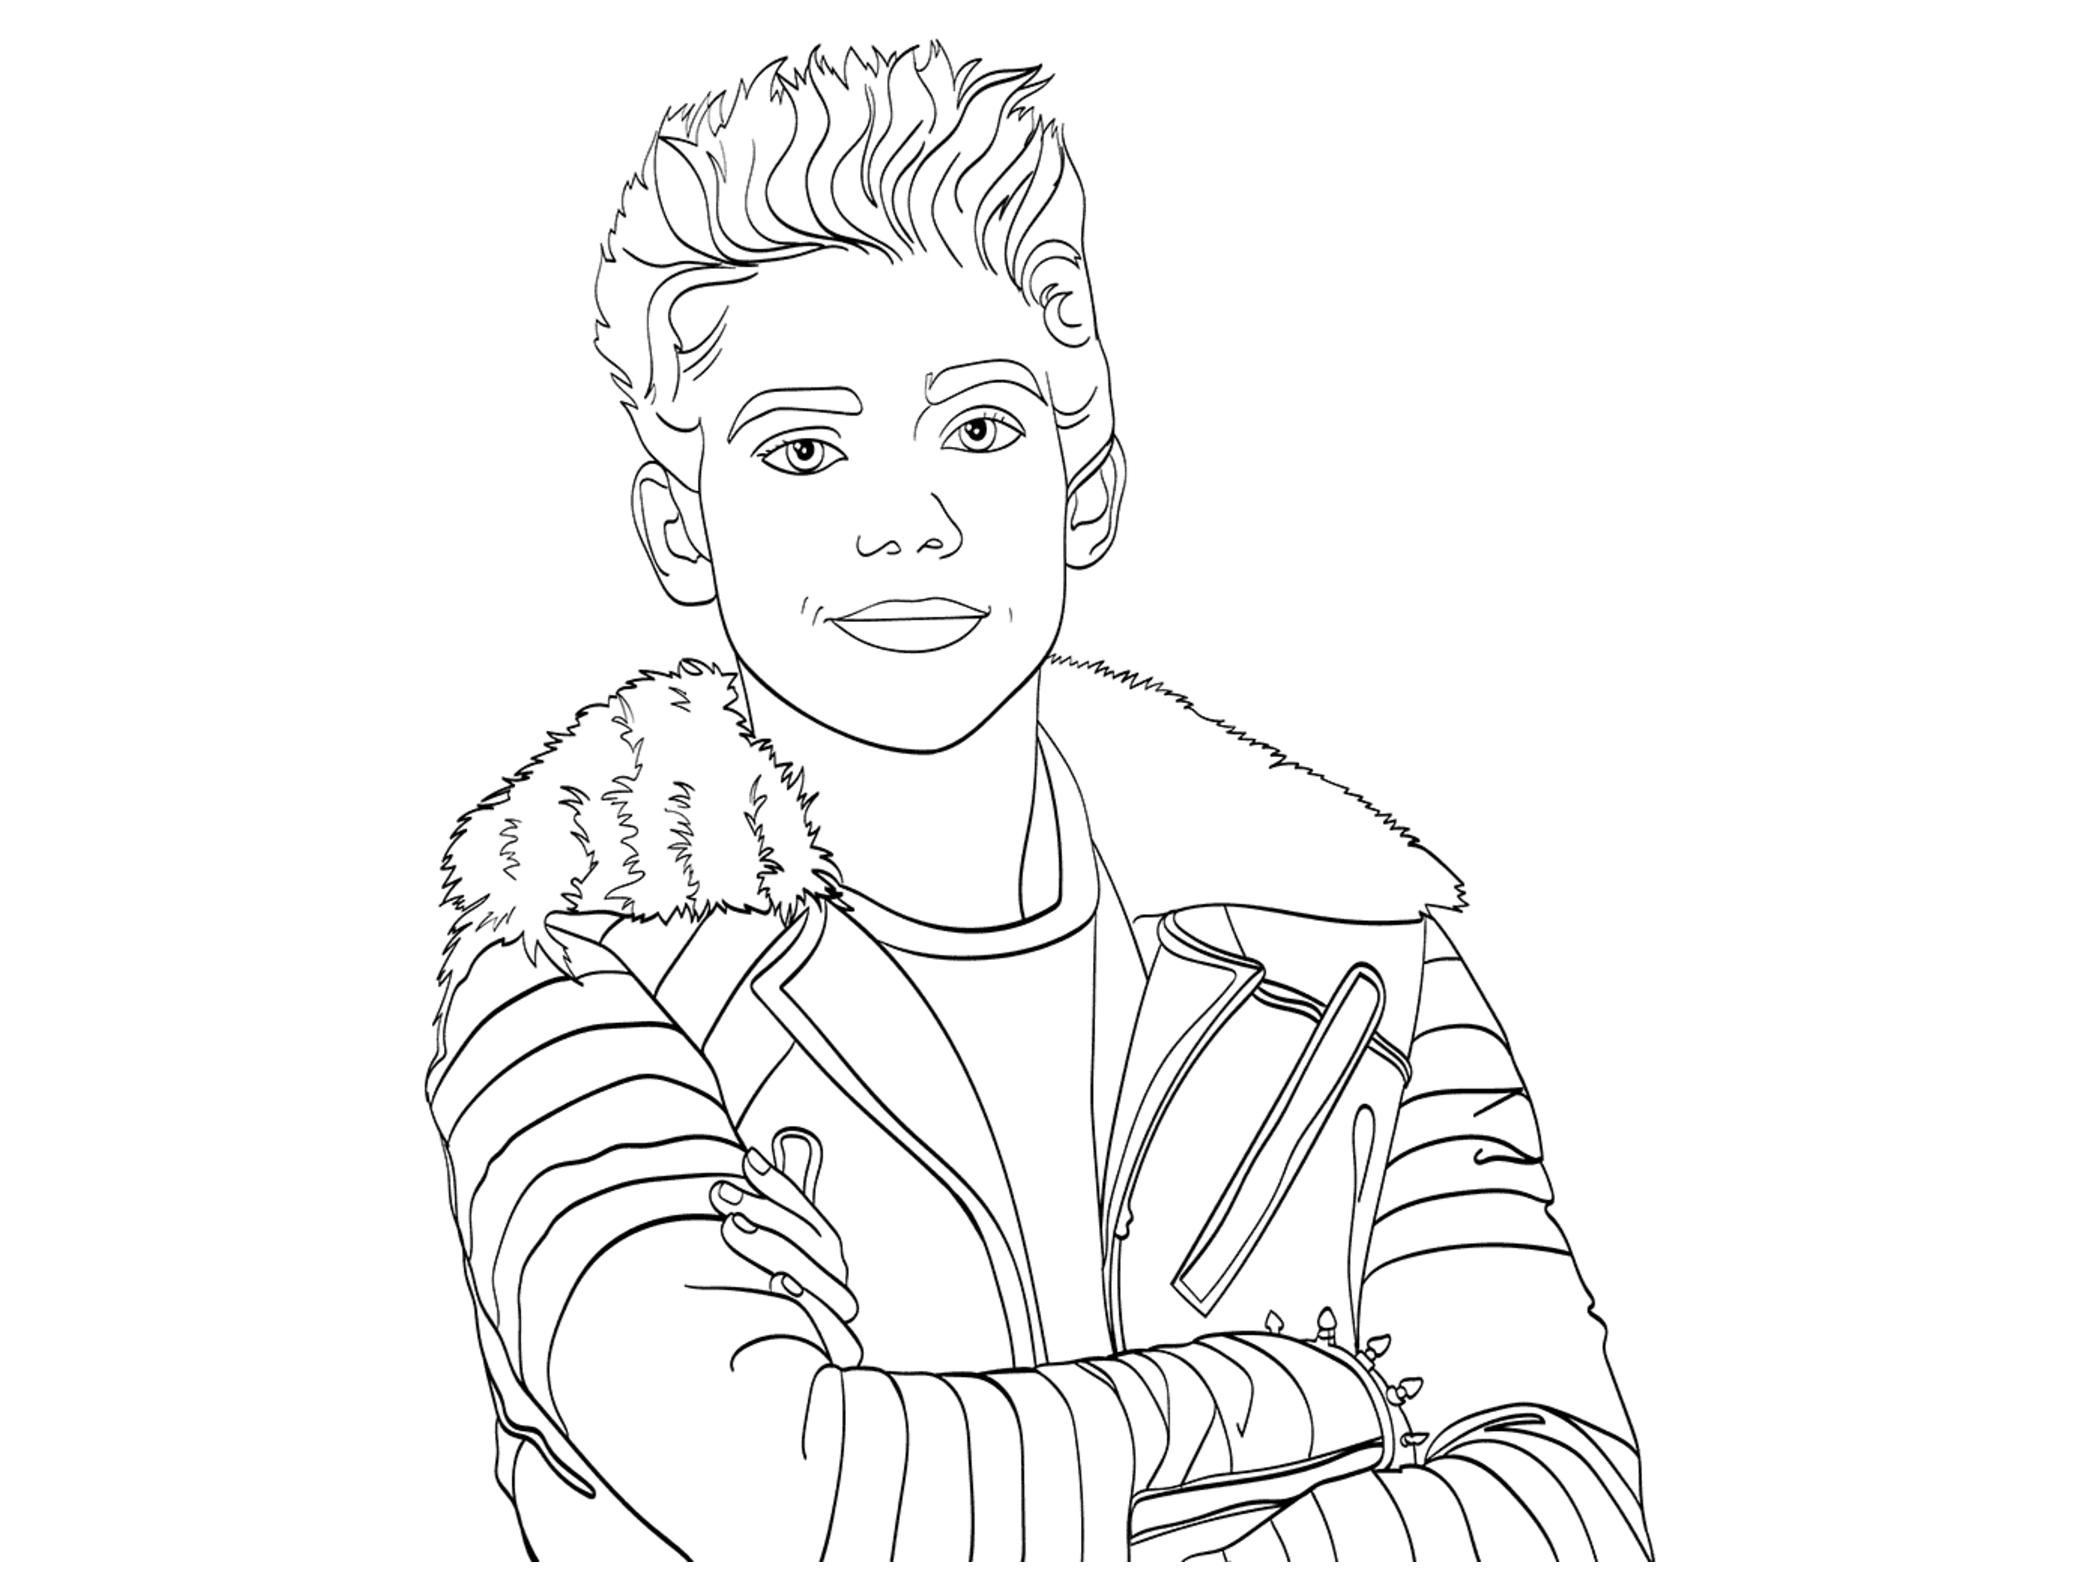 Descendants Ausmalbilder : Jay from Descendants coloring page